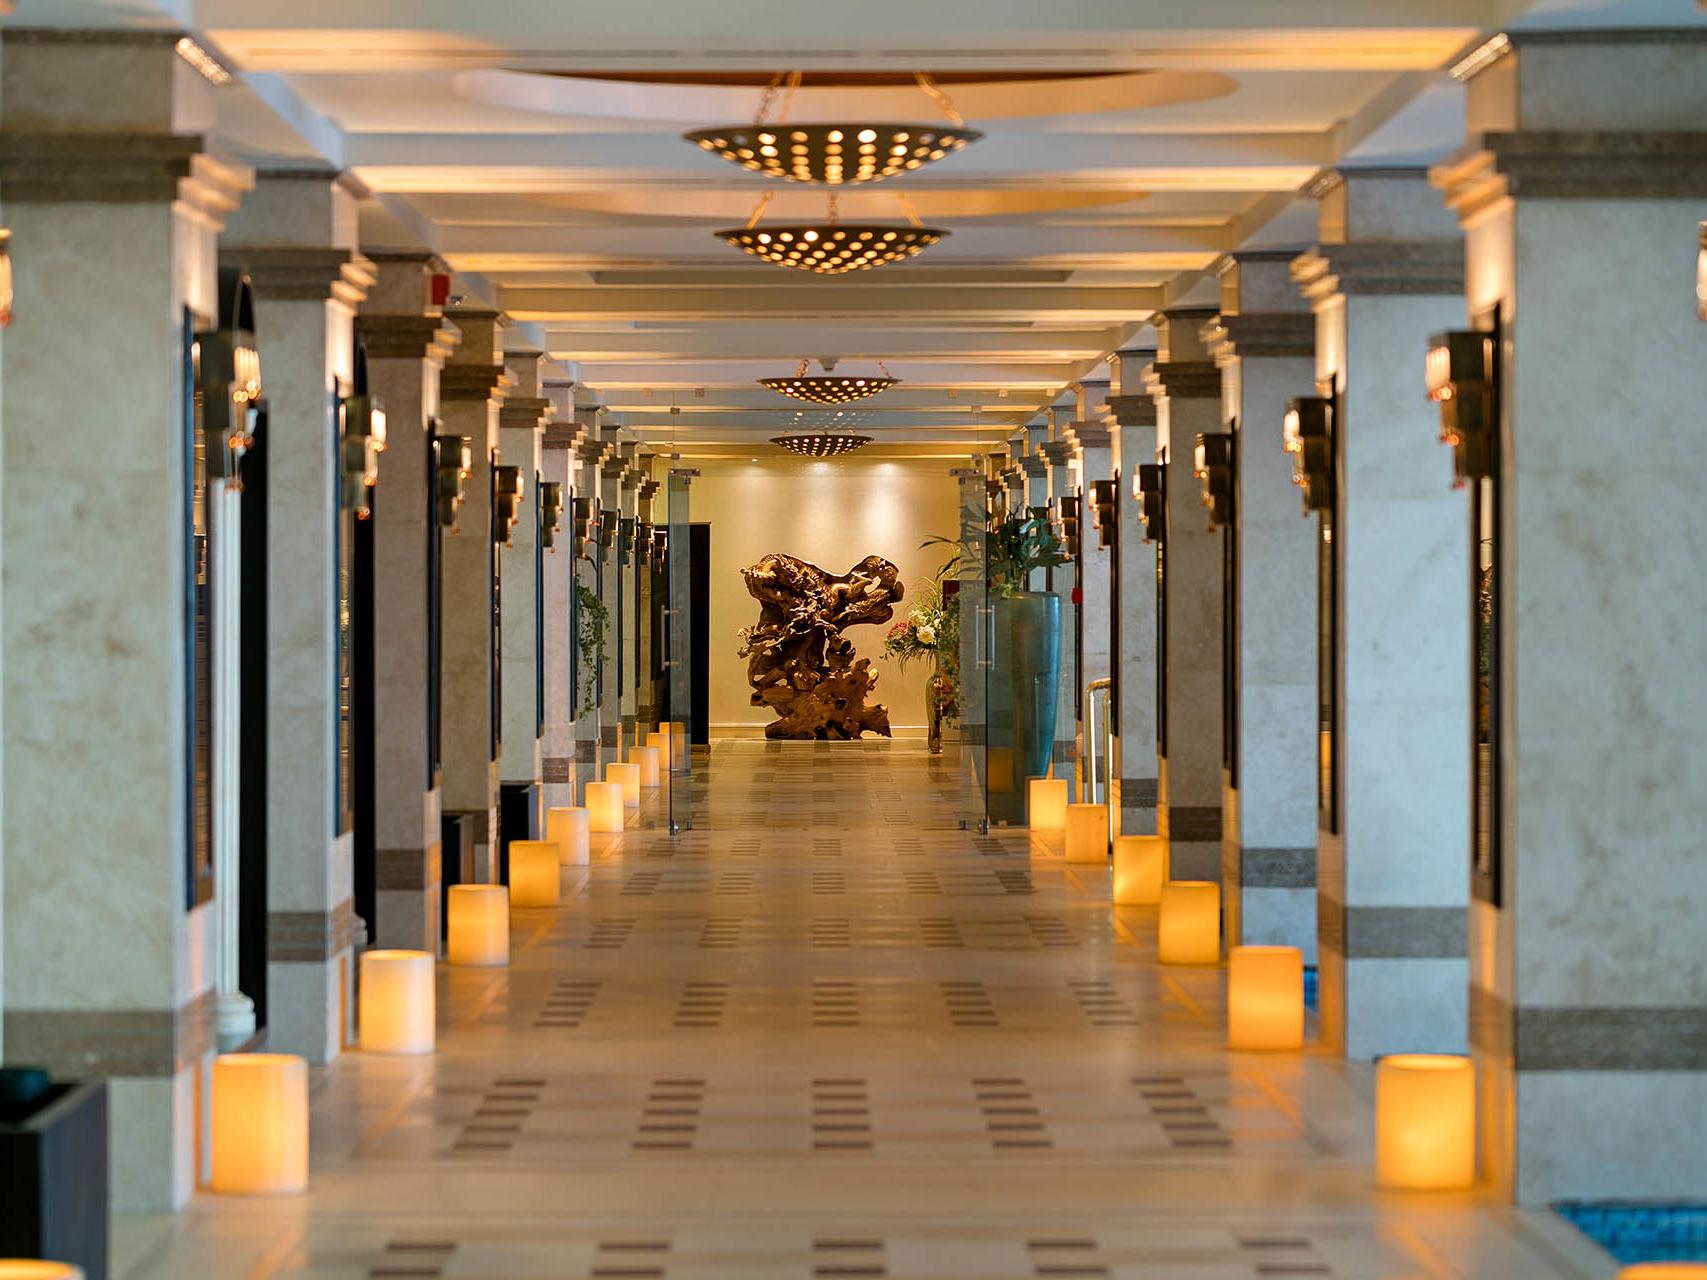 Mardanpalacehotel-Otel-Mermer-Dekorasyon- (11)